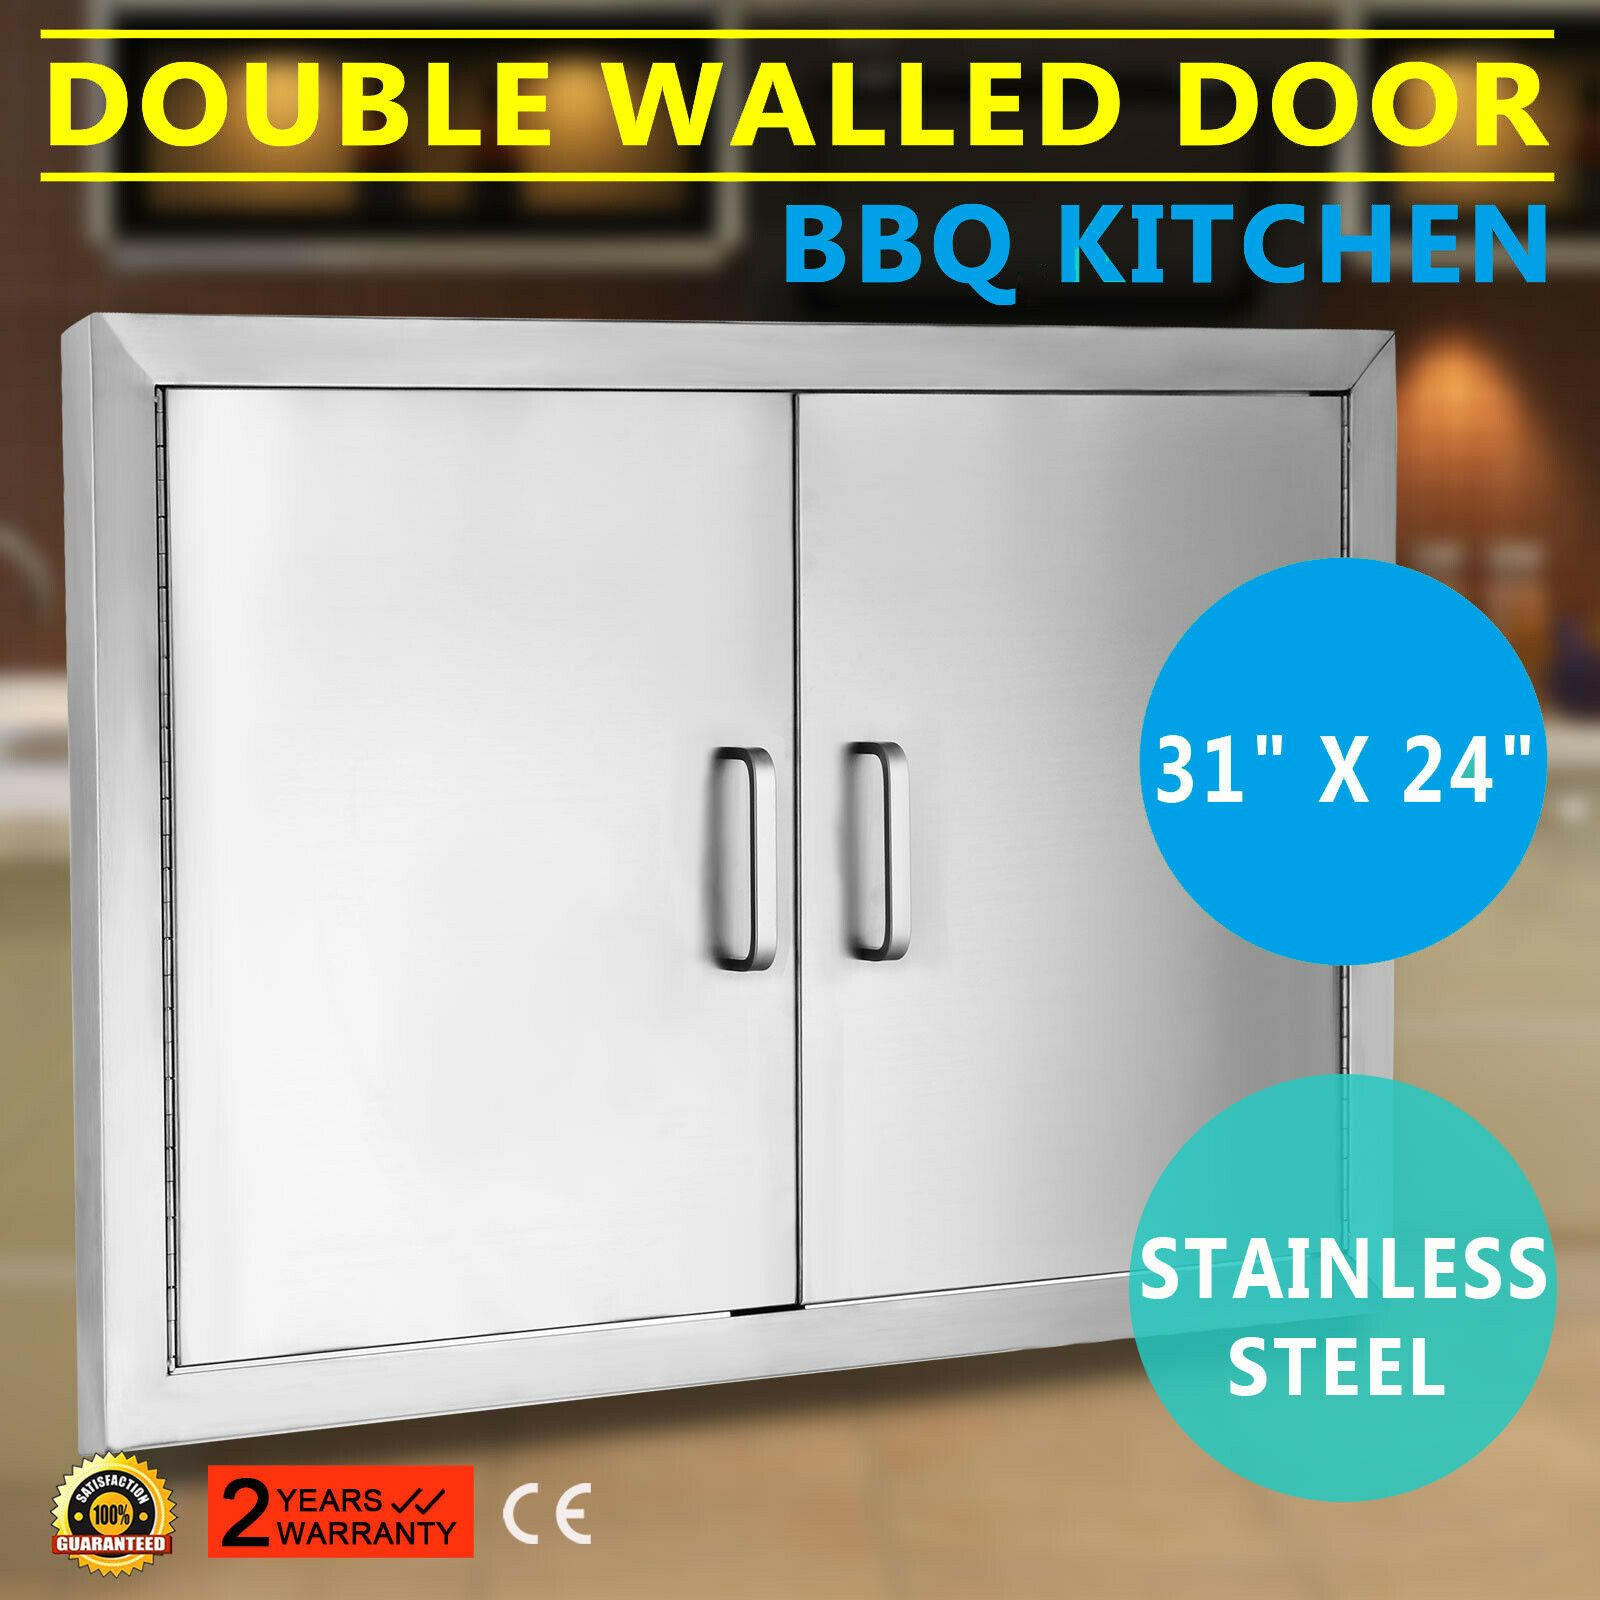 Outdoor Kitchen Bbq Island 304 Stainless Steel Double Access Door 31 Usa In 2020 Vertical Storage Bbq Island Outdoor Kitchen